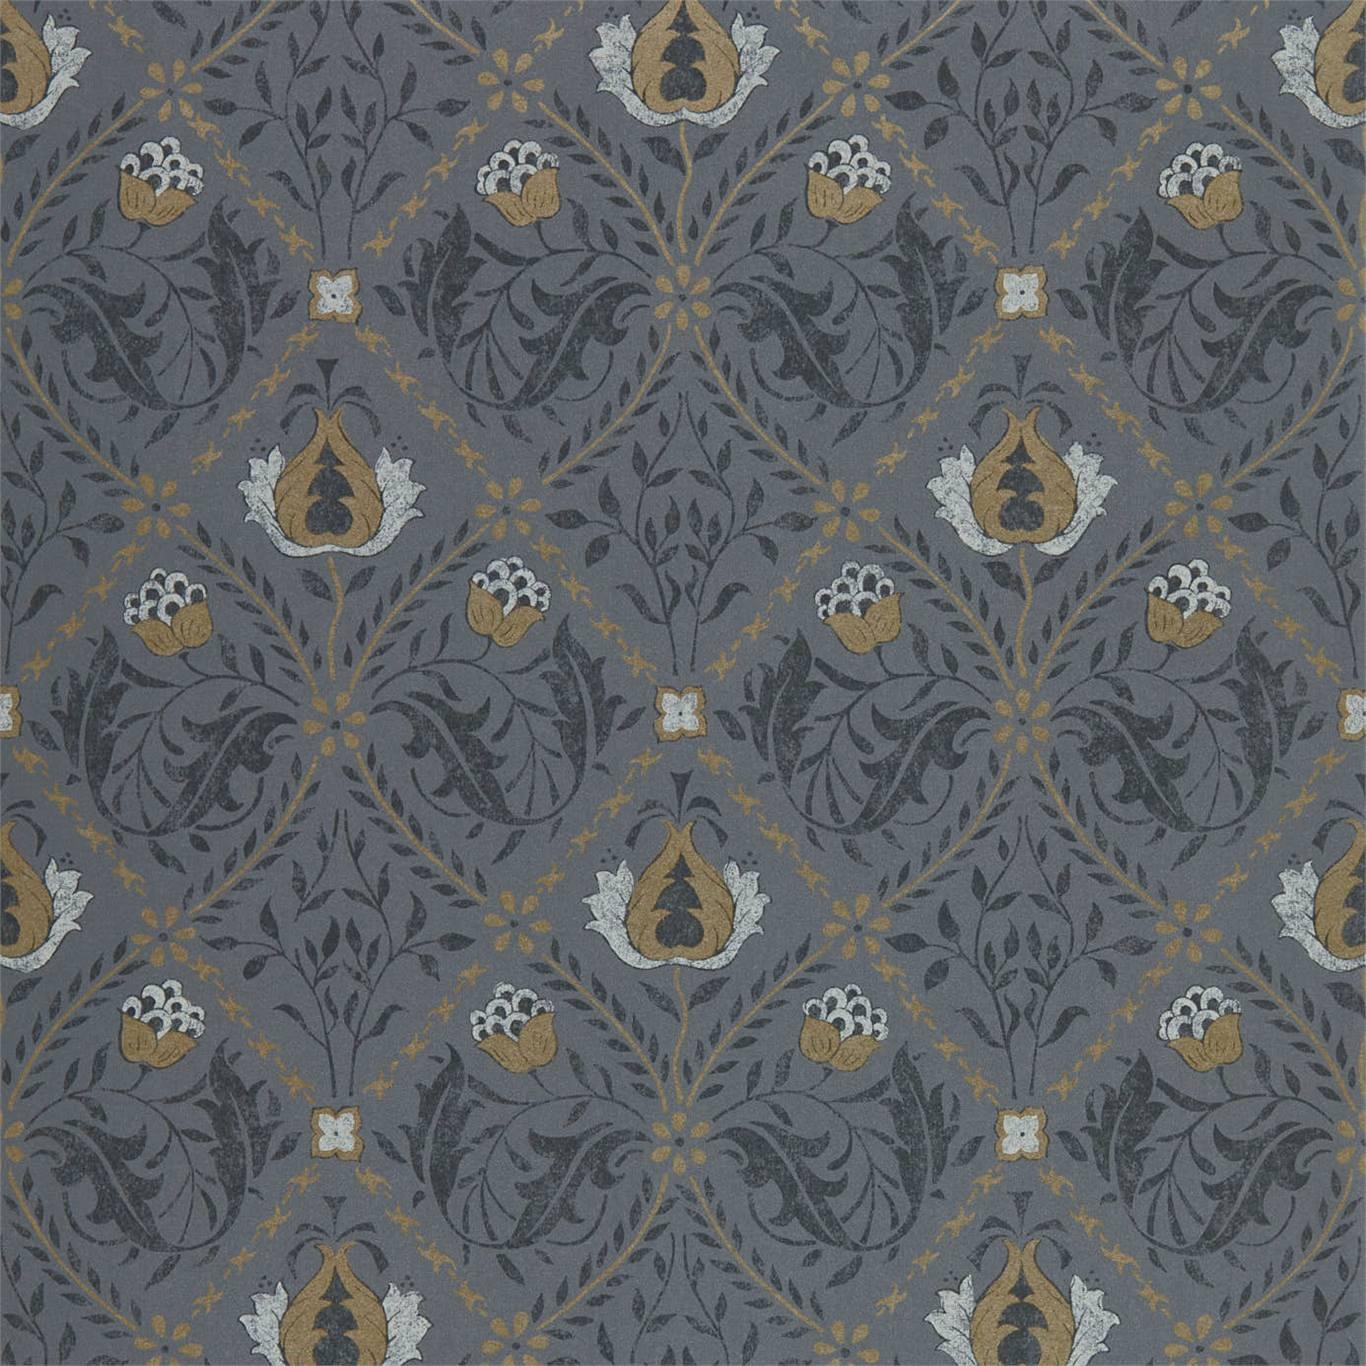 Image of Morris & Co Pure Trellis Black Ink Wallpaper 216527